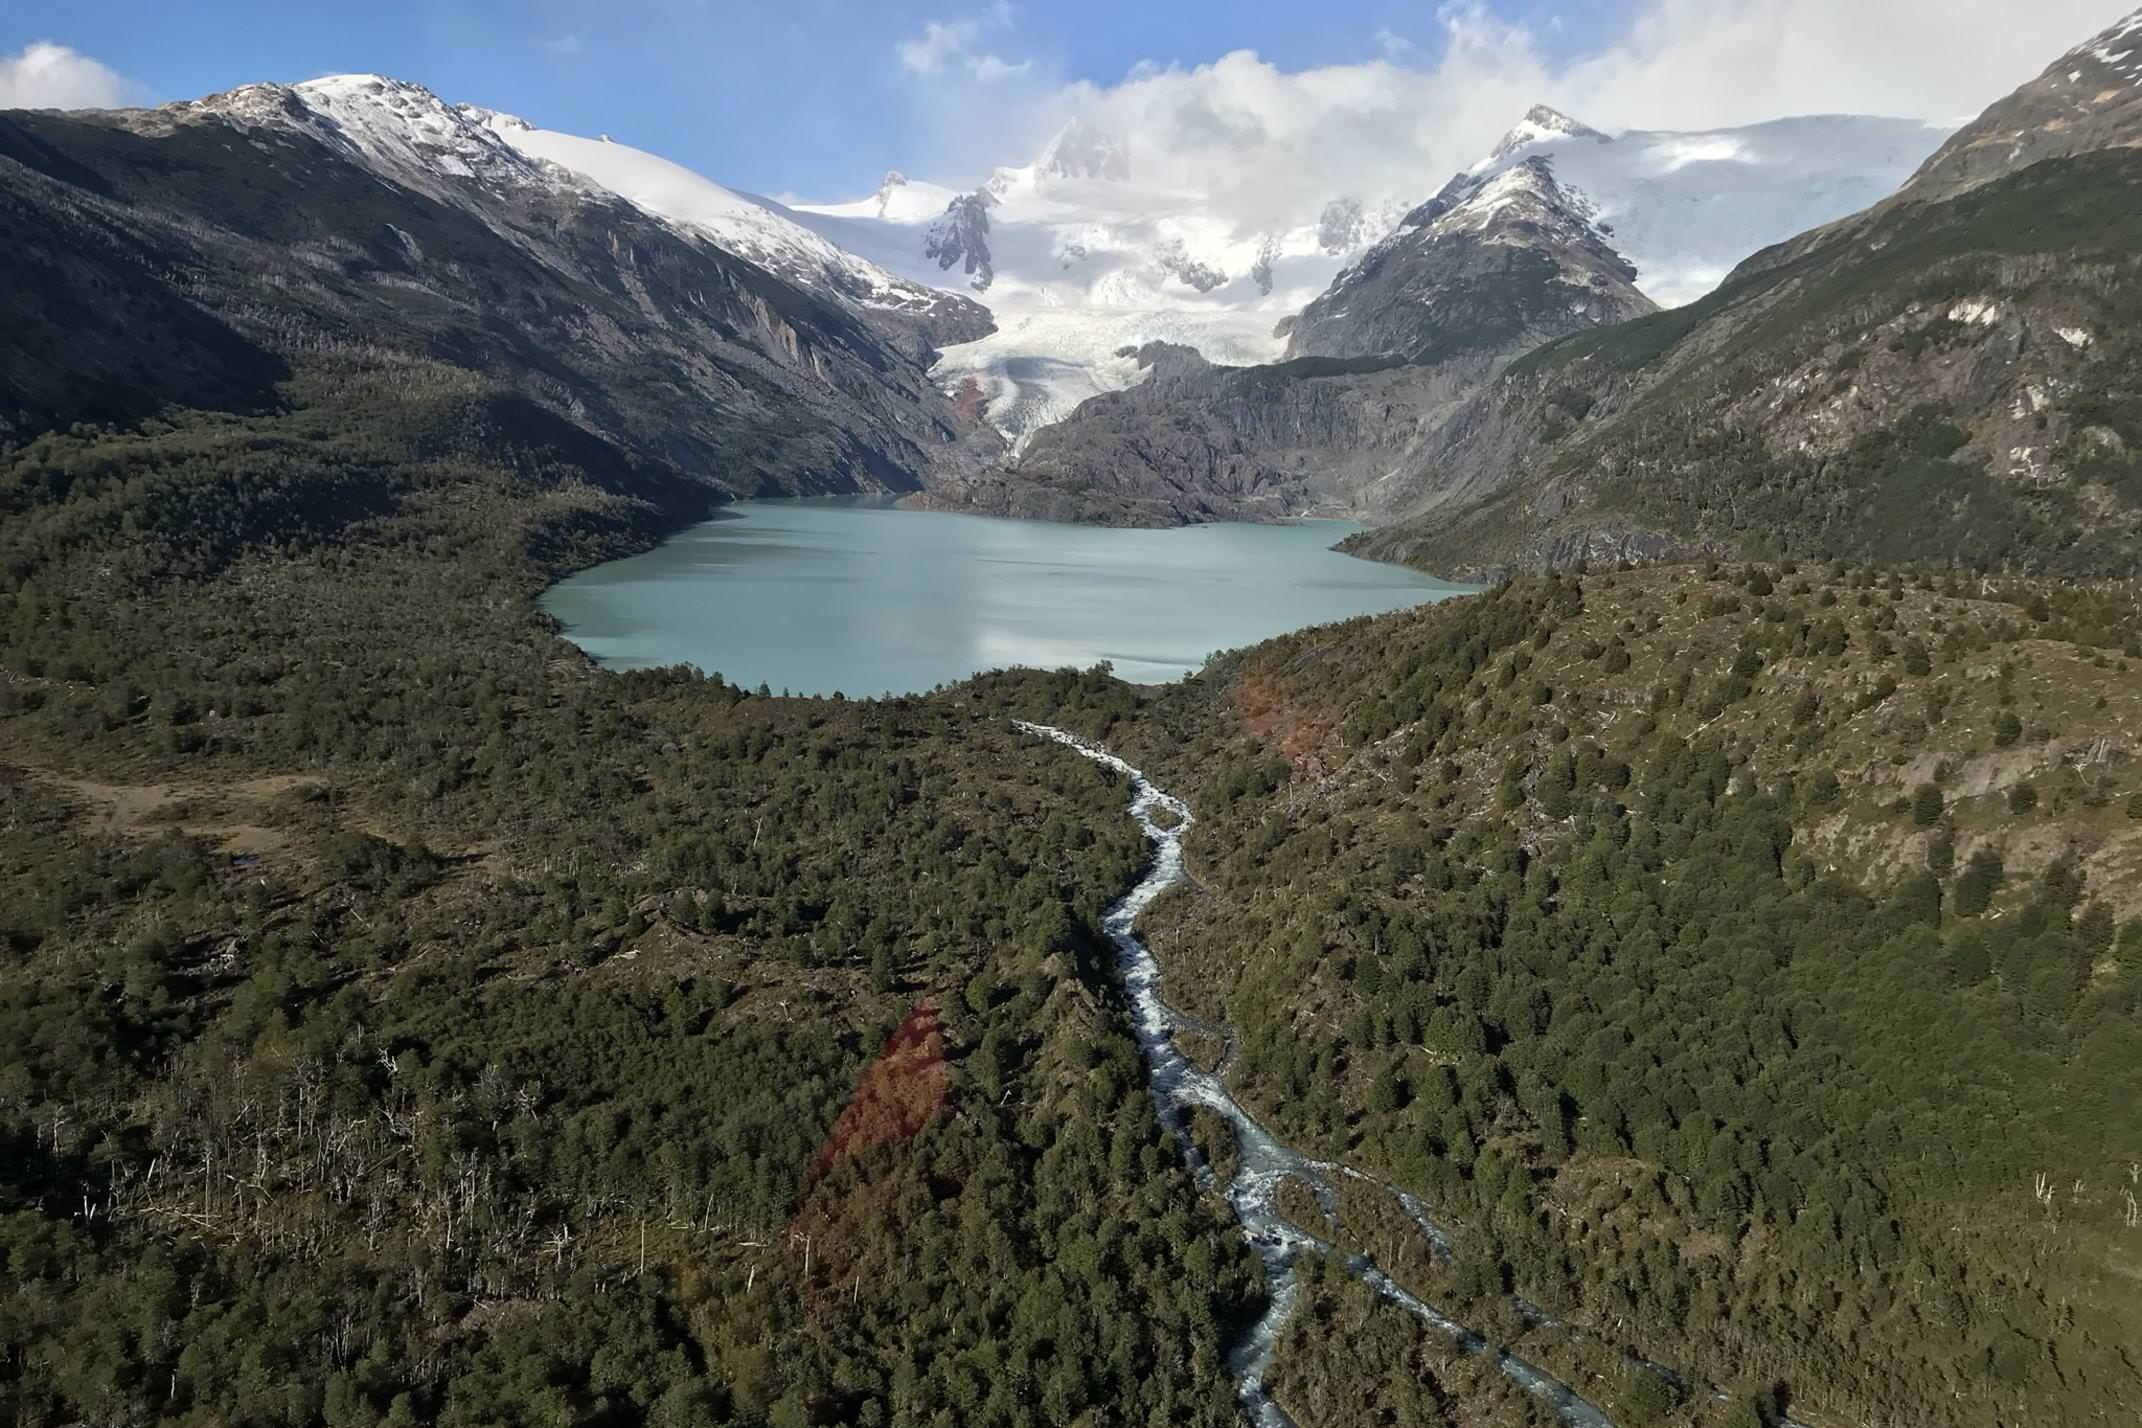 Chile carretera austral c caroline mackie pura traveller7